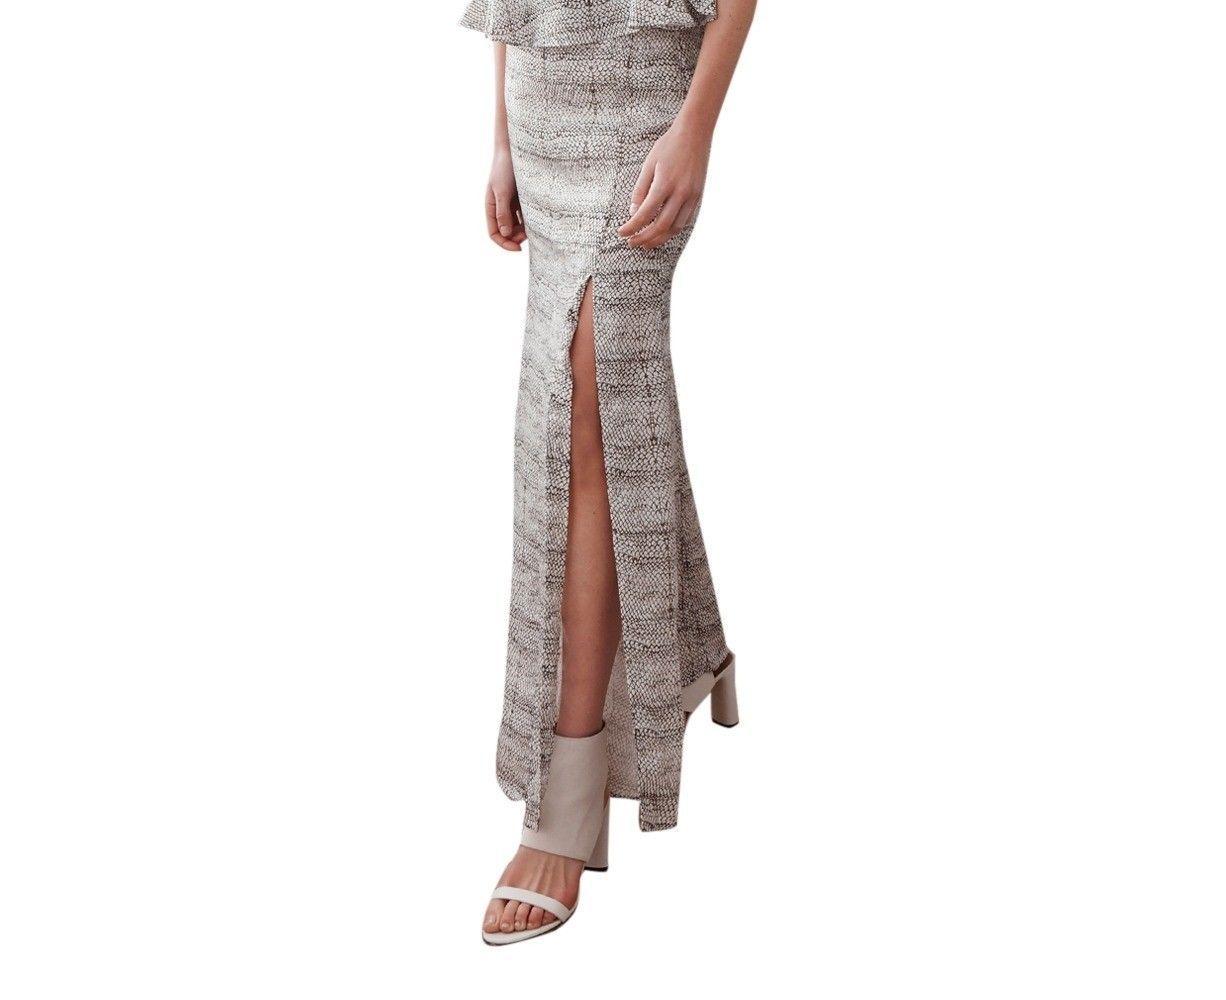 NWT STEVIE MAY Maxi Skirt Small long mermaid style high front split $260 viper - $116.40